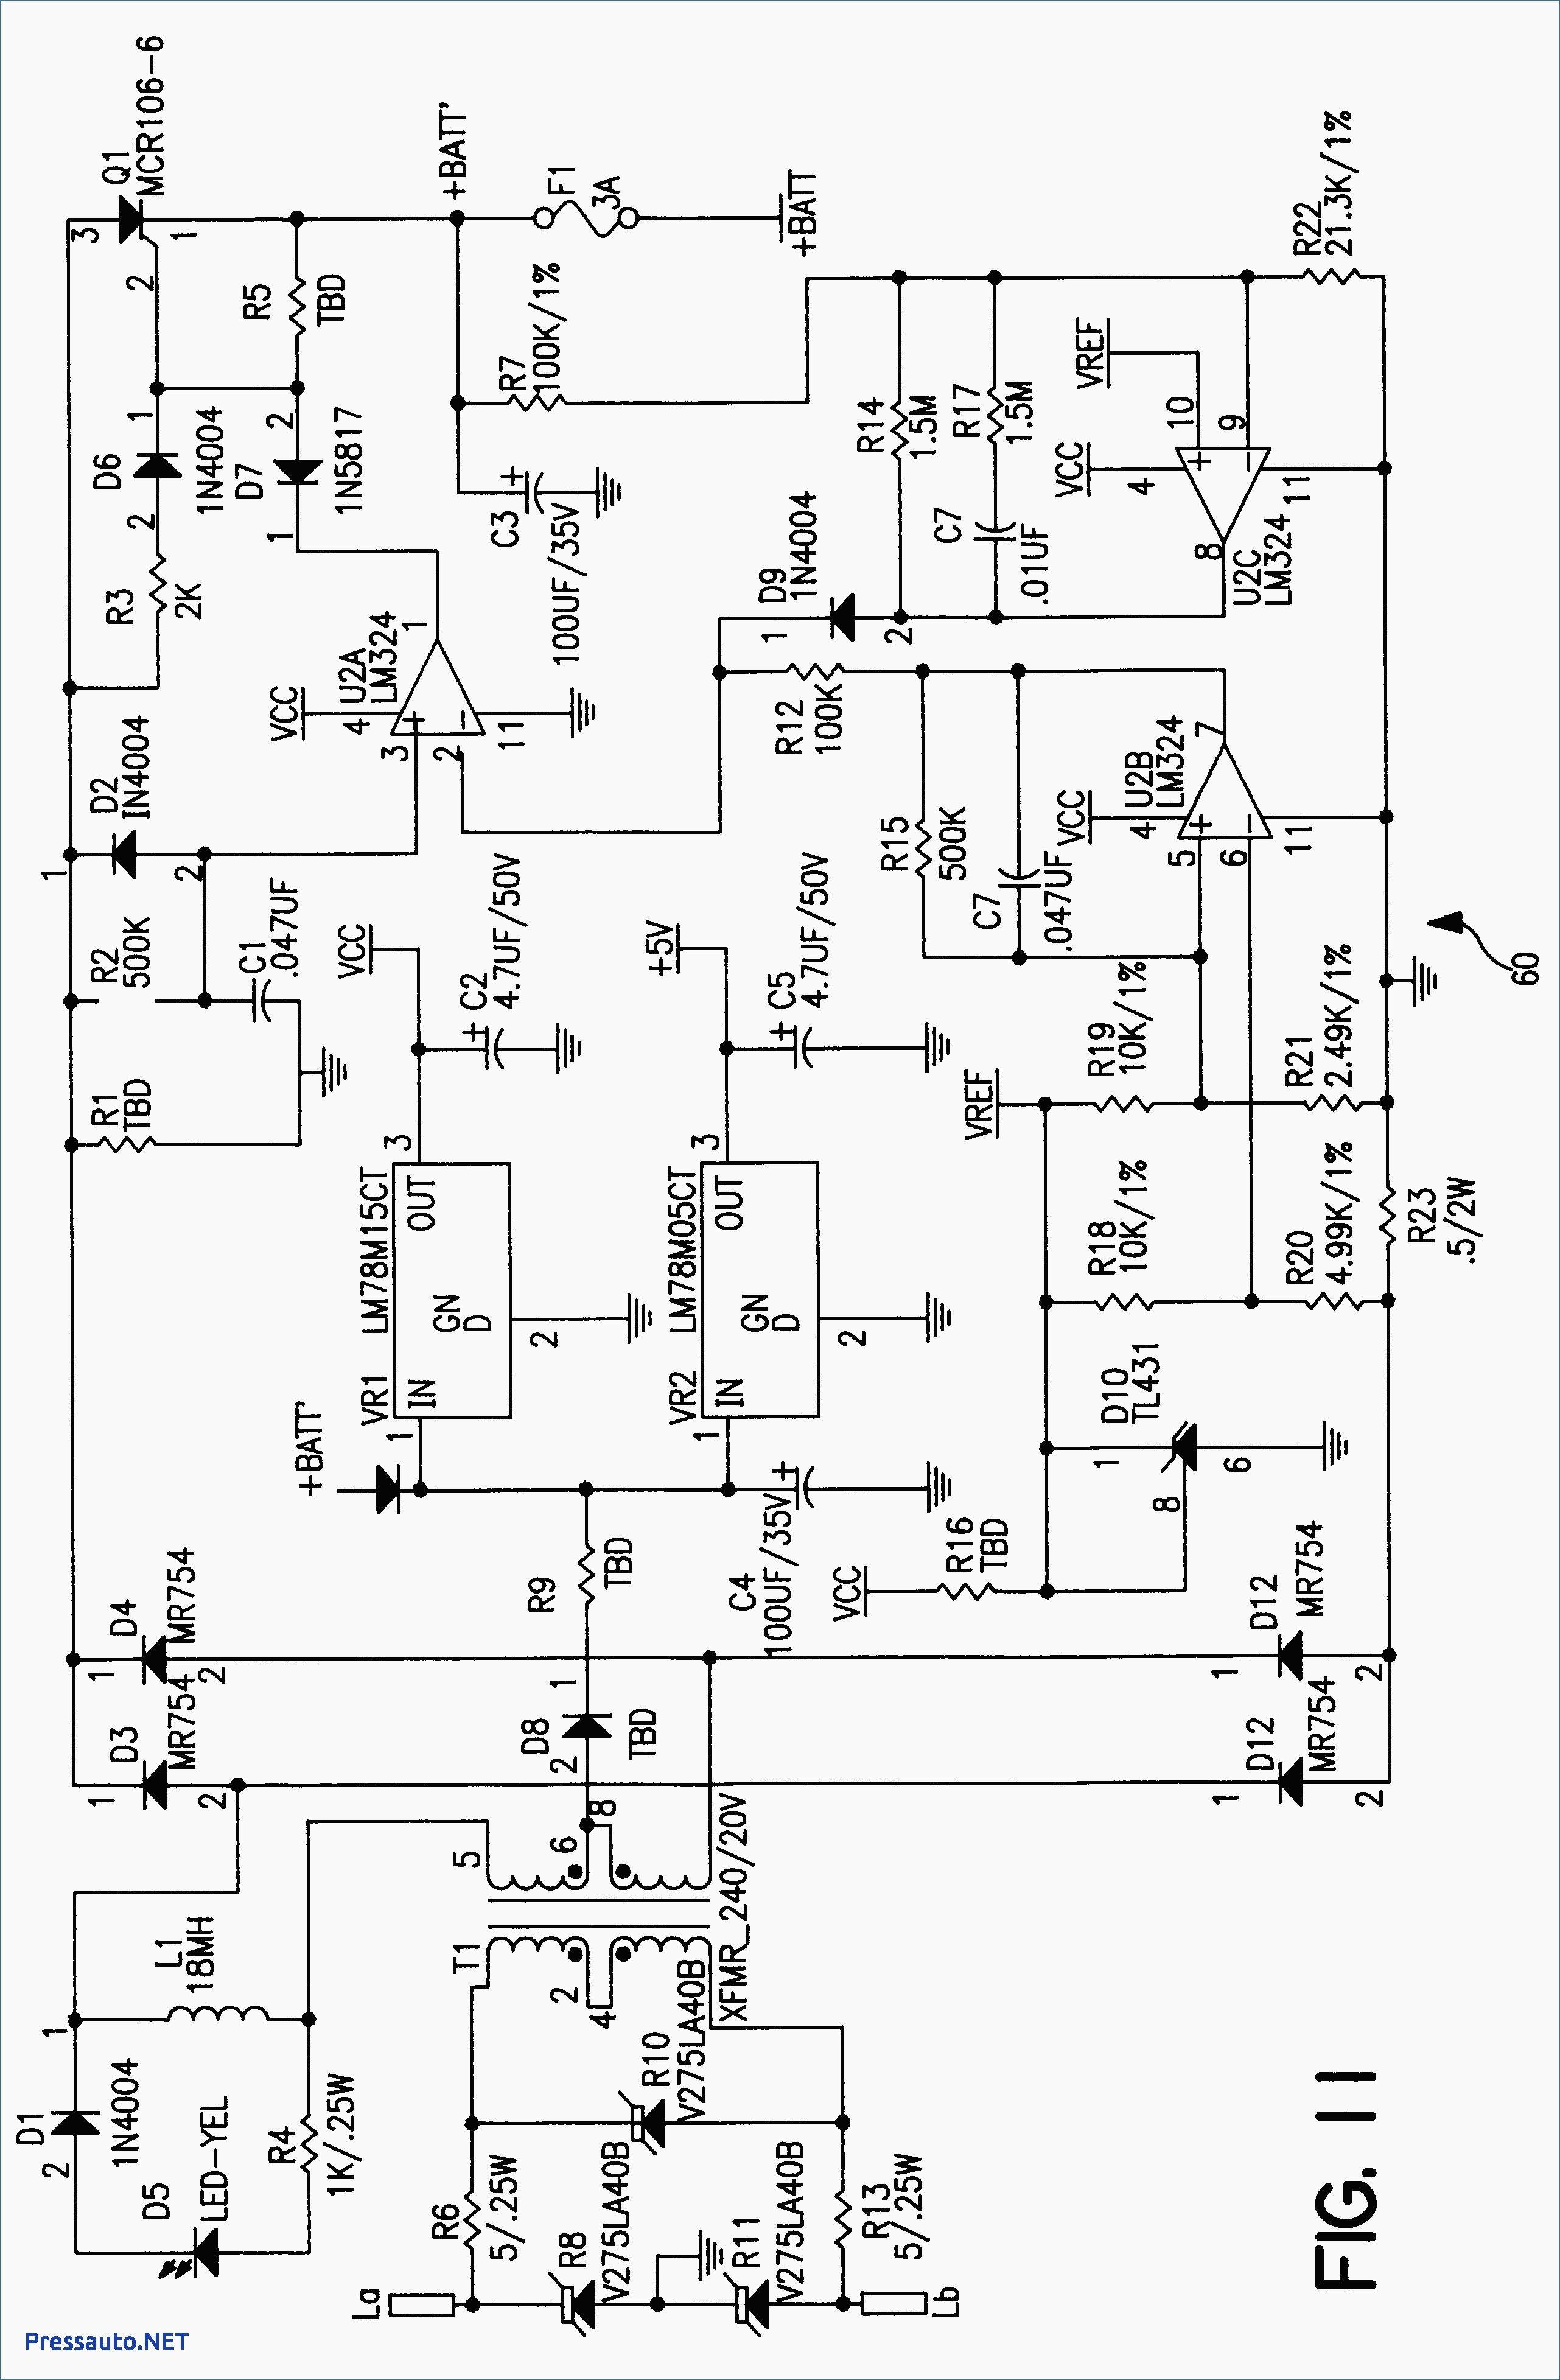 home generator transfer switch wiring diagram wiring diagram ideas generator fuel system diagram generator solenoid diagram [ 2563 x 3910 Pixel ]